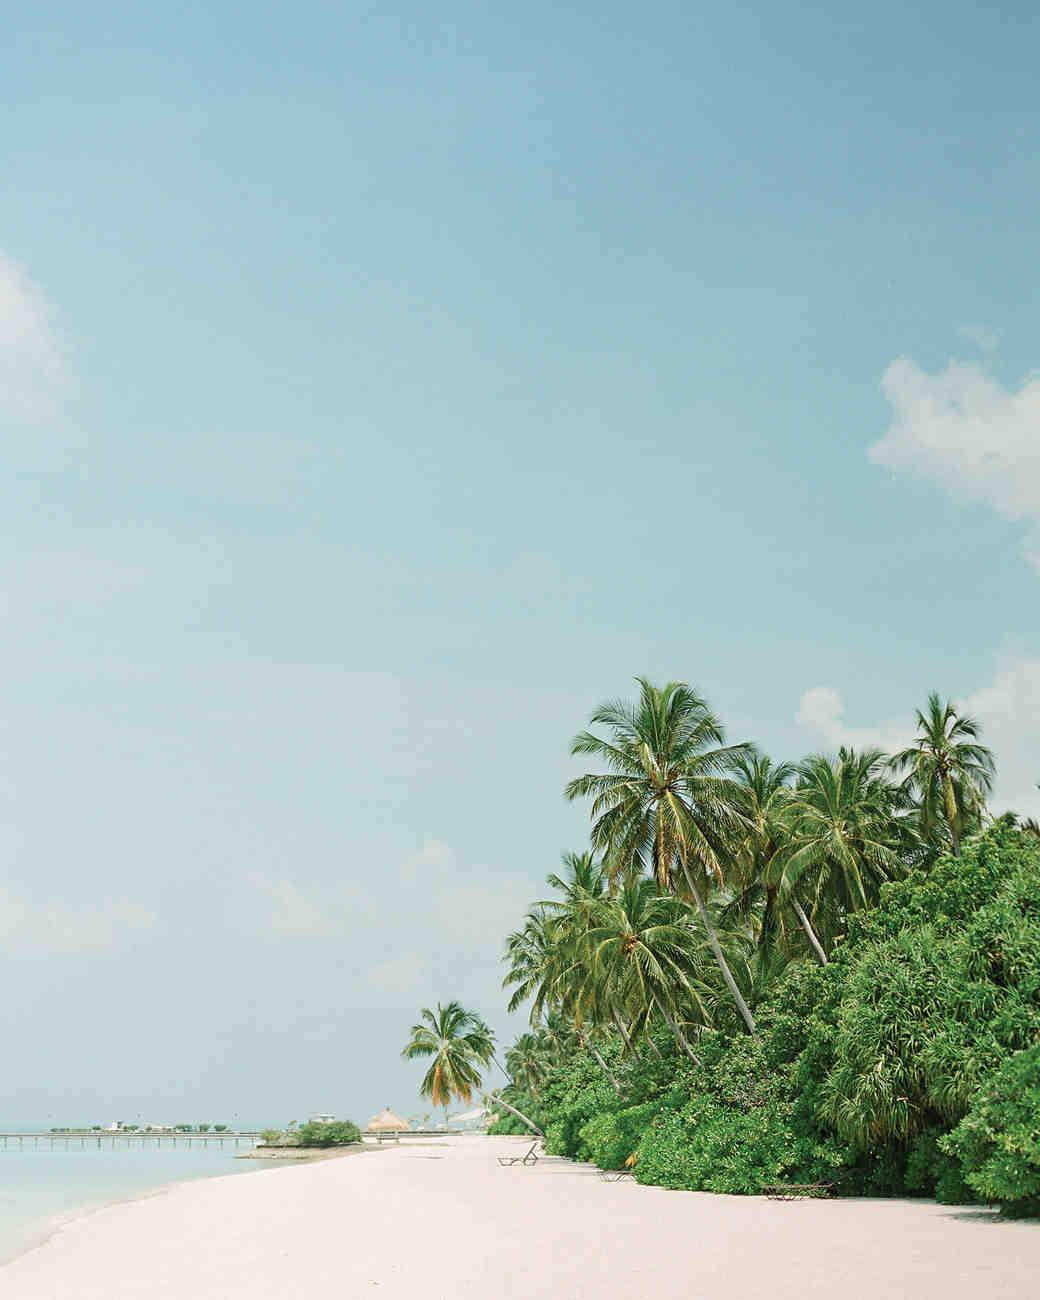 peony-richard-wedding-maldives-beach-palm-trees-1868-s112383.jpg